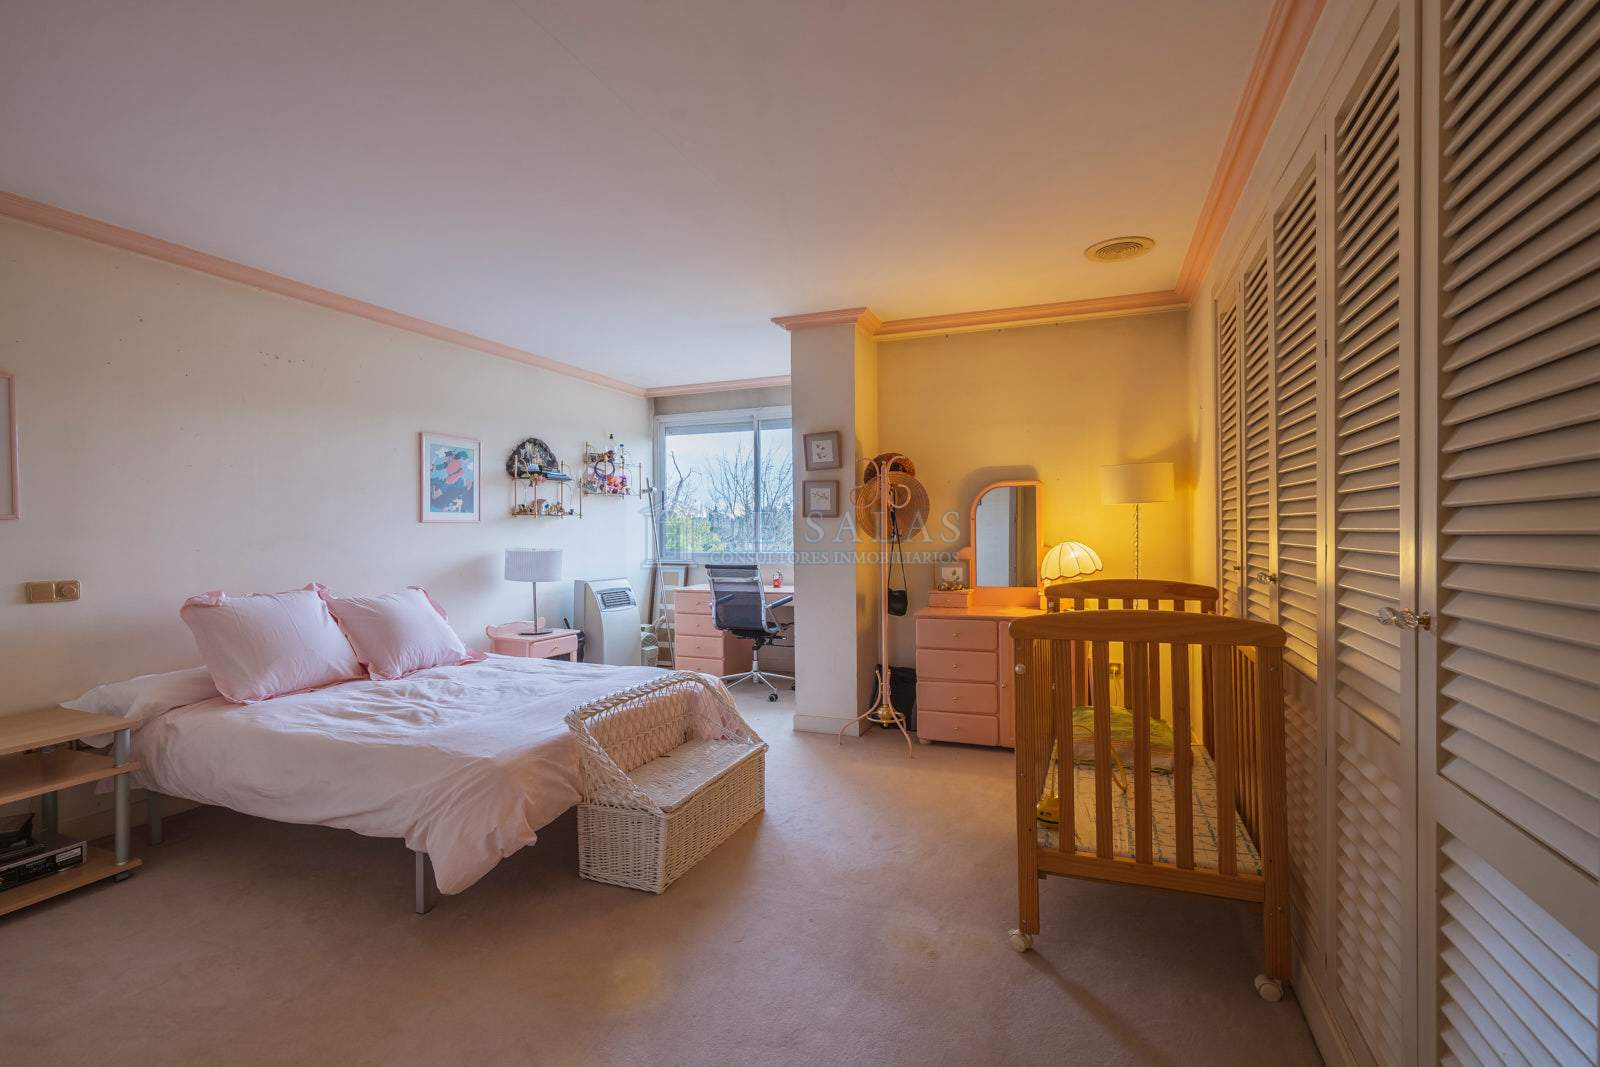 Dormitorio-28 Chalet La Moraleja